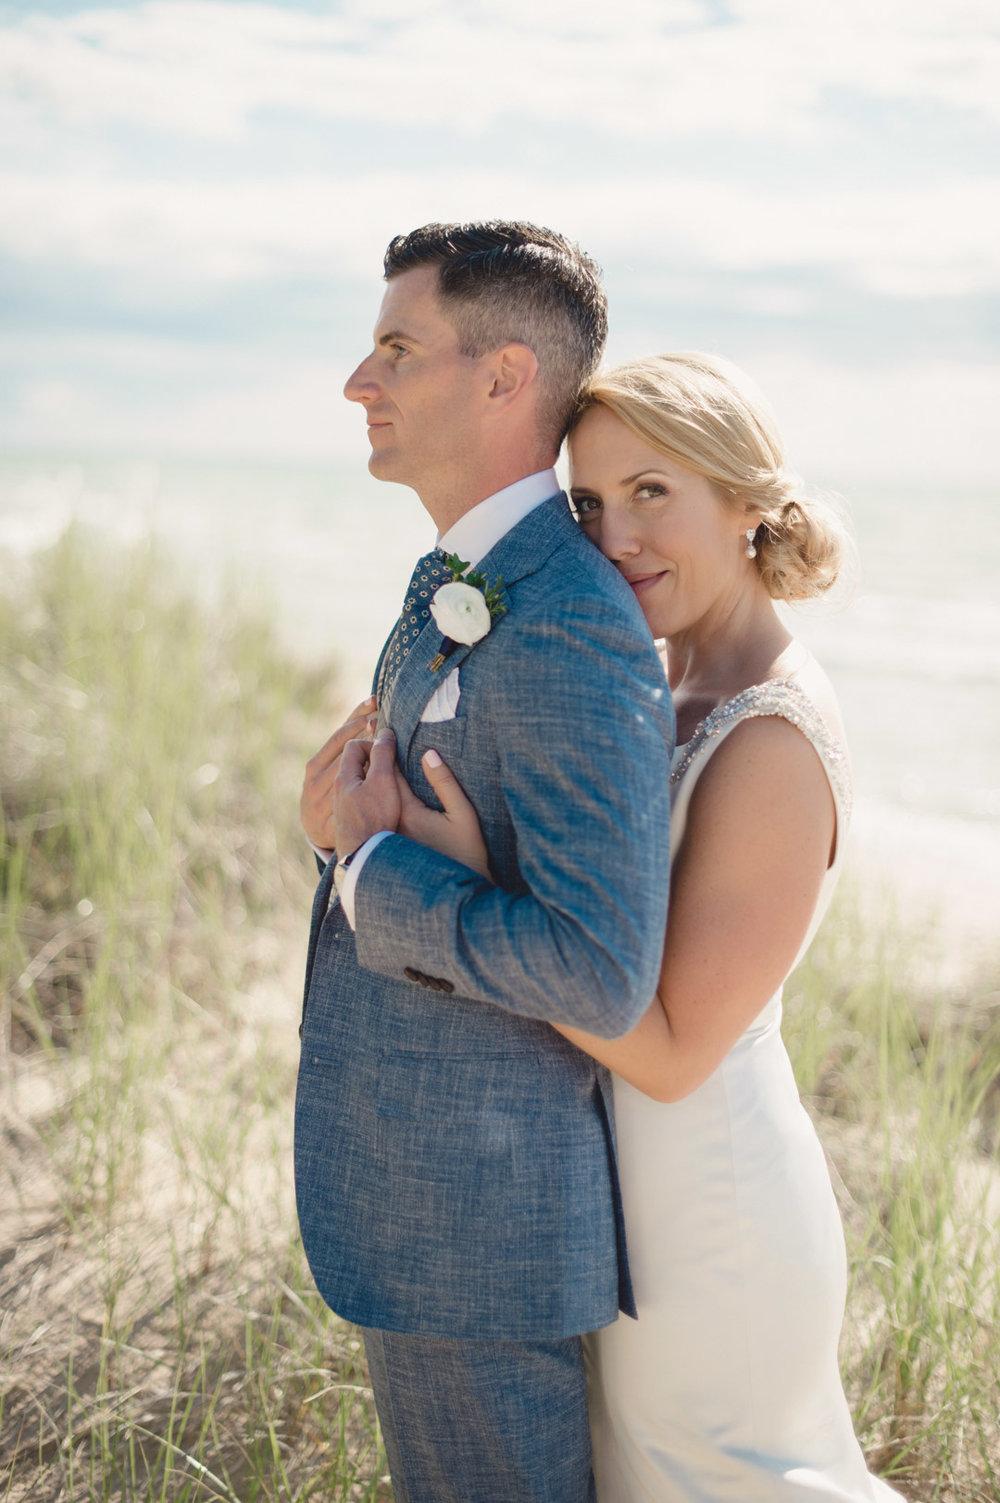 Beach-wedding-lake-michigan-361.jpg